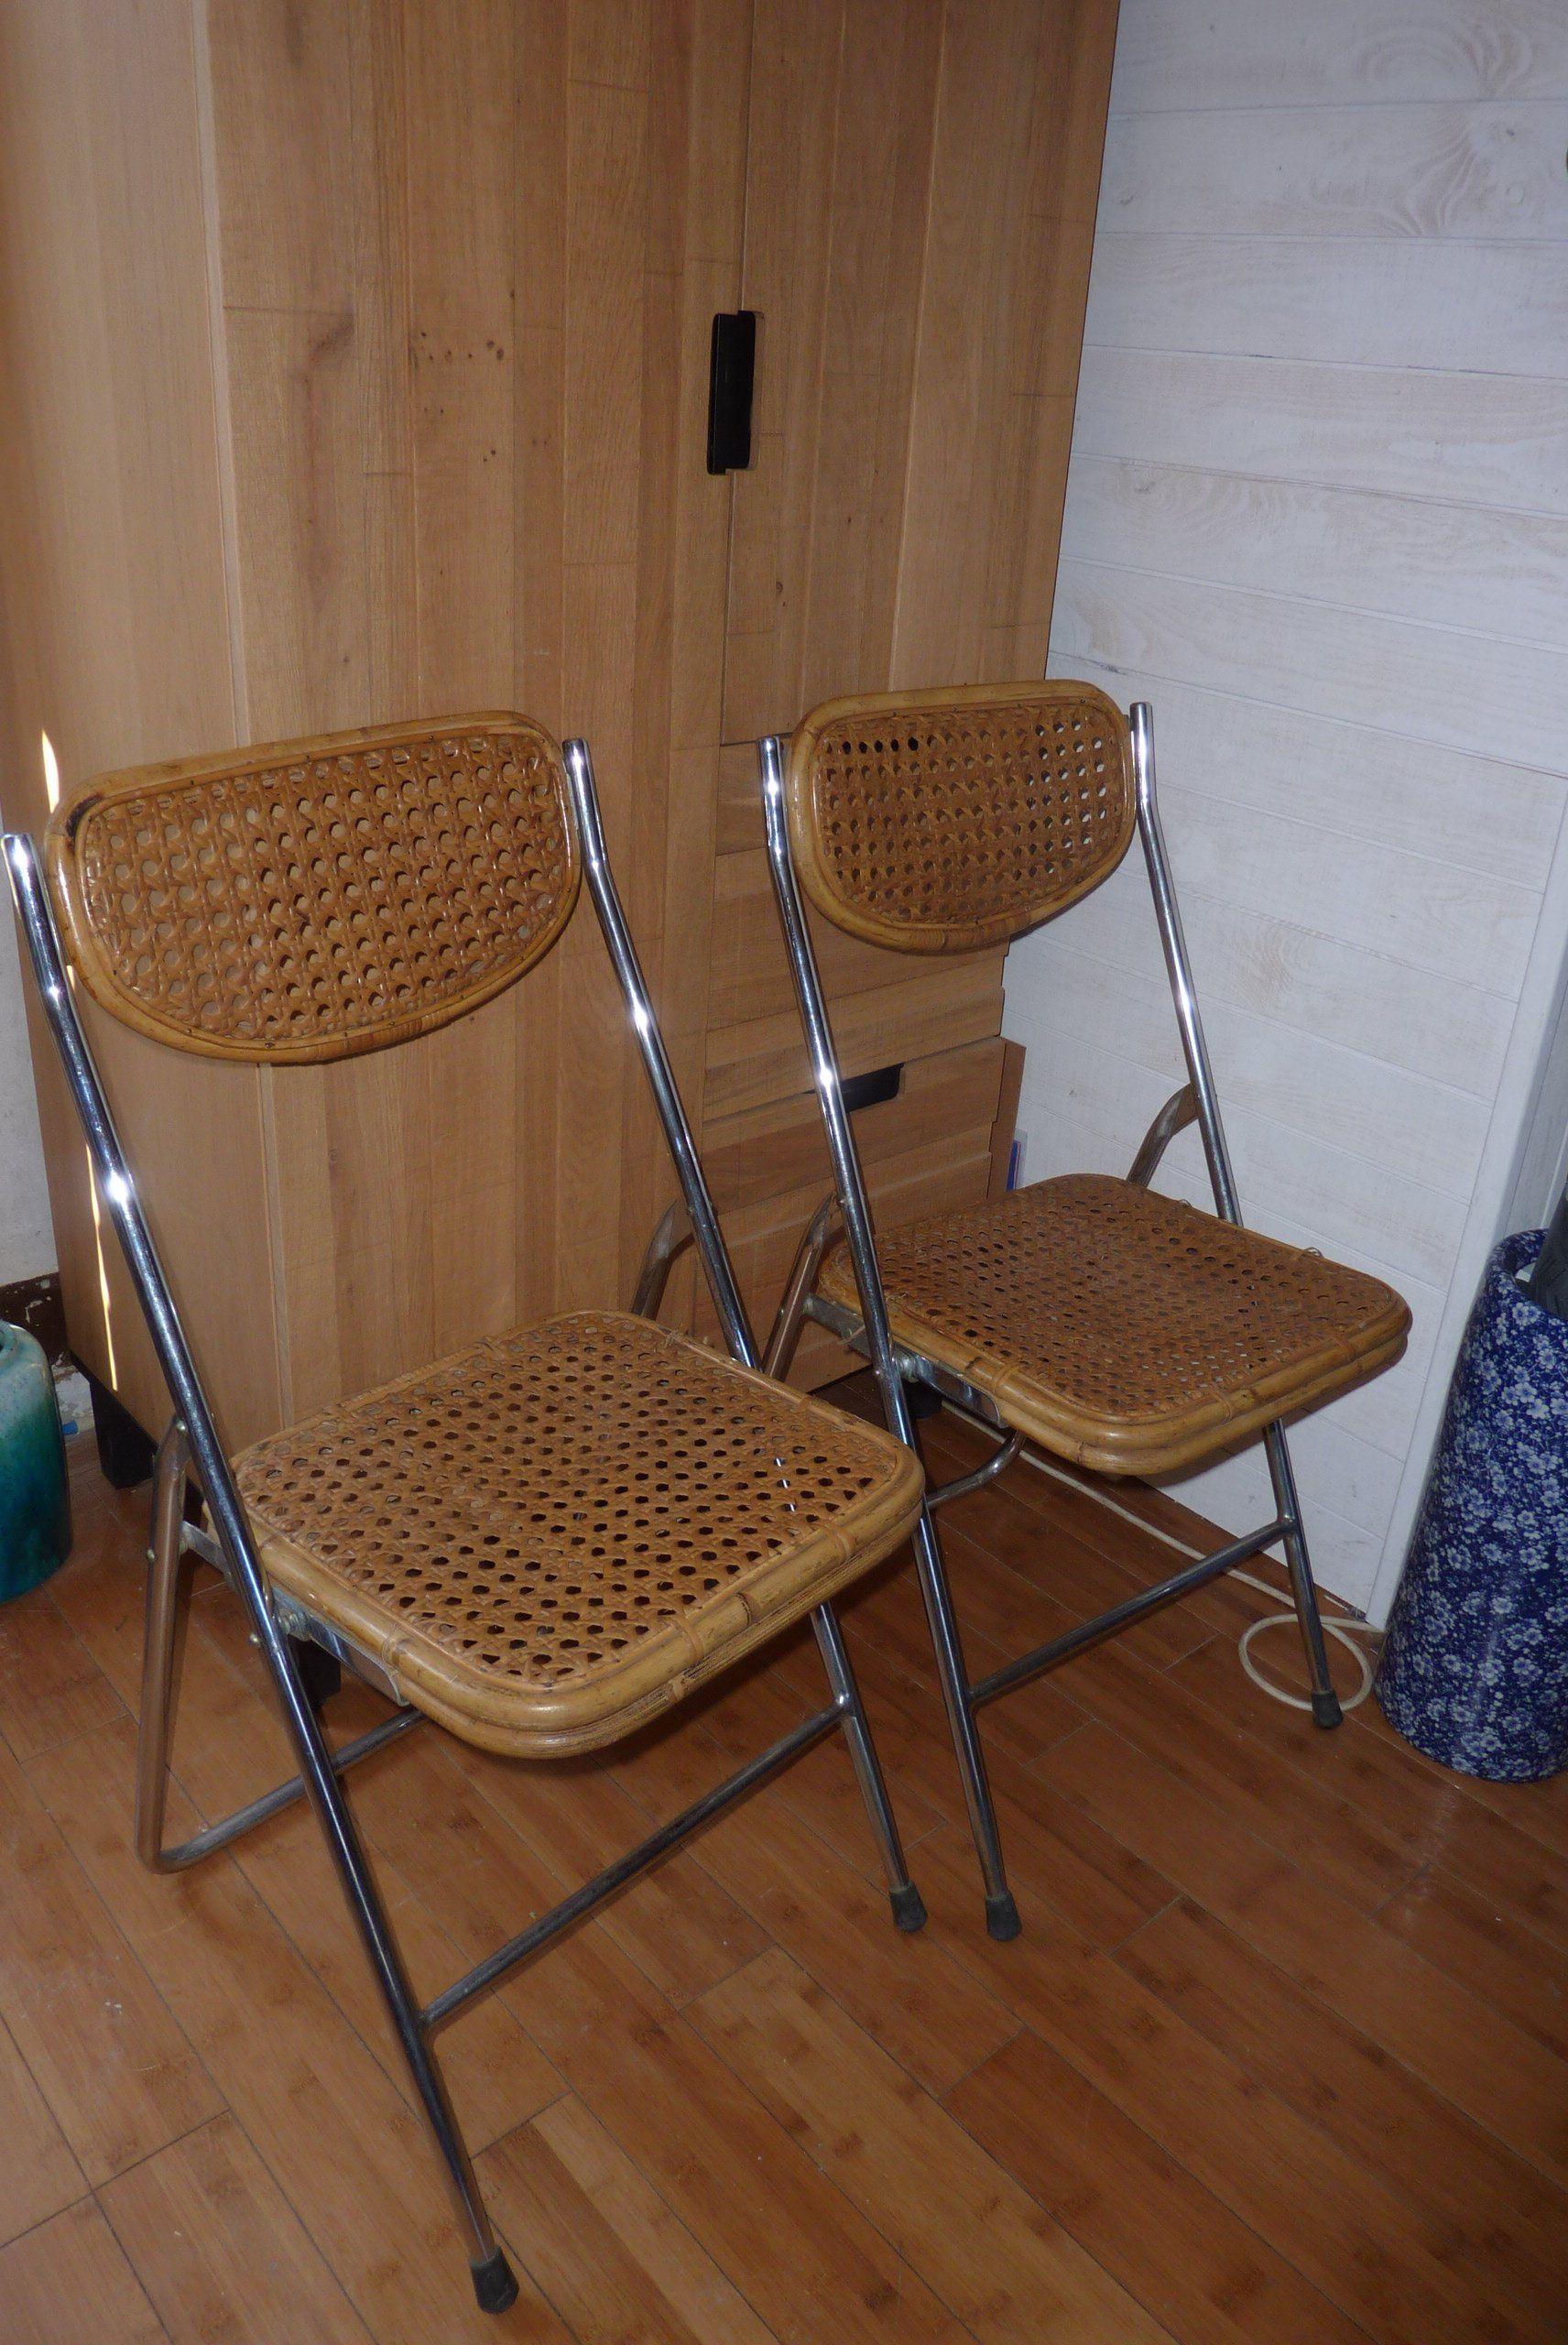 Chaise Pliante Pliable Design En Metal Bambou Cannage Cannees Vintage Annees 70 Folding Chair Chair Chair Design